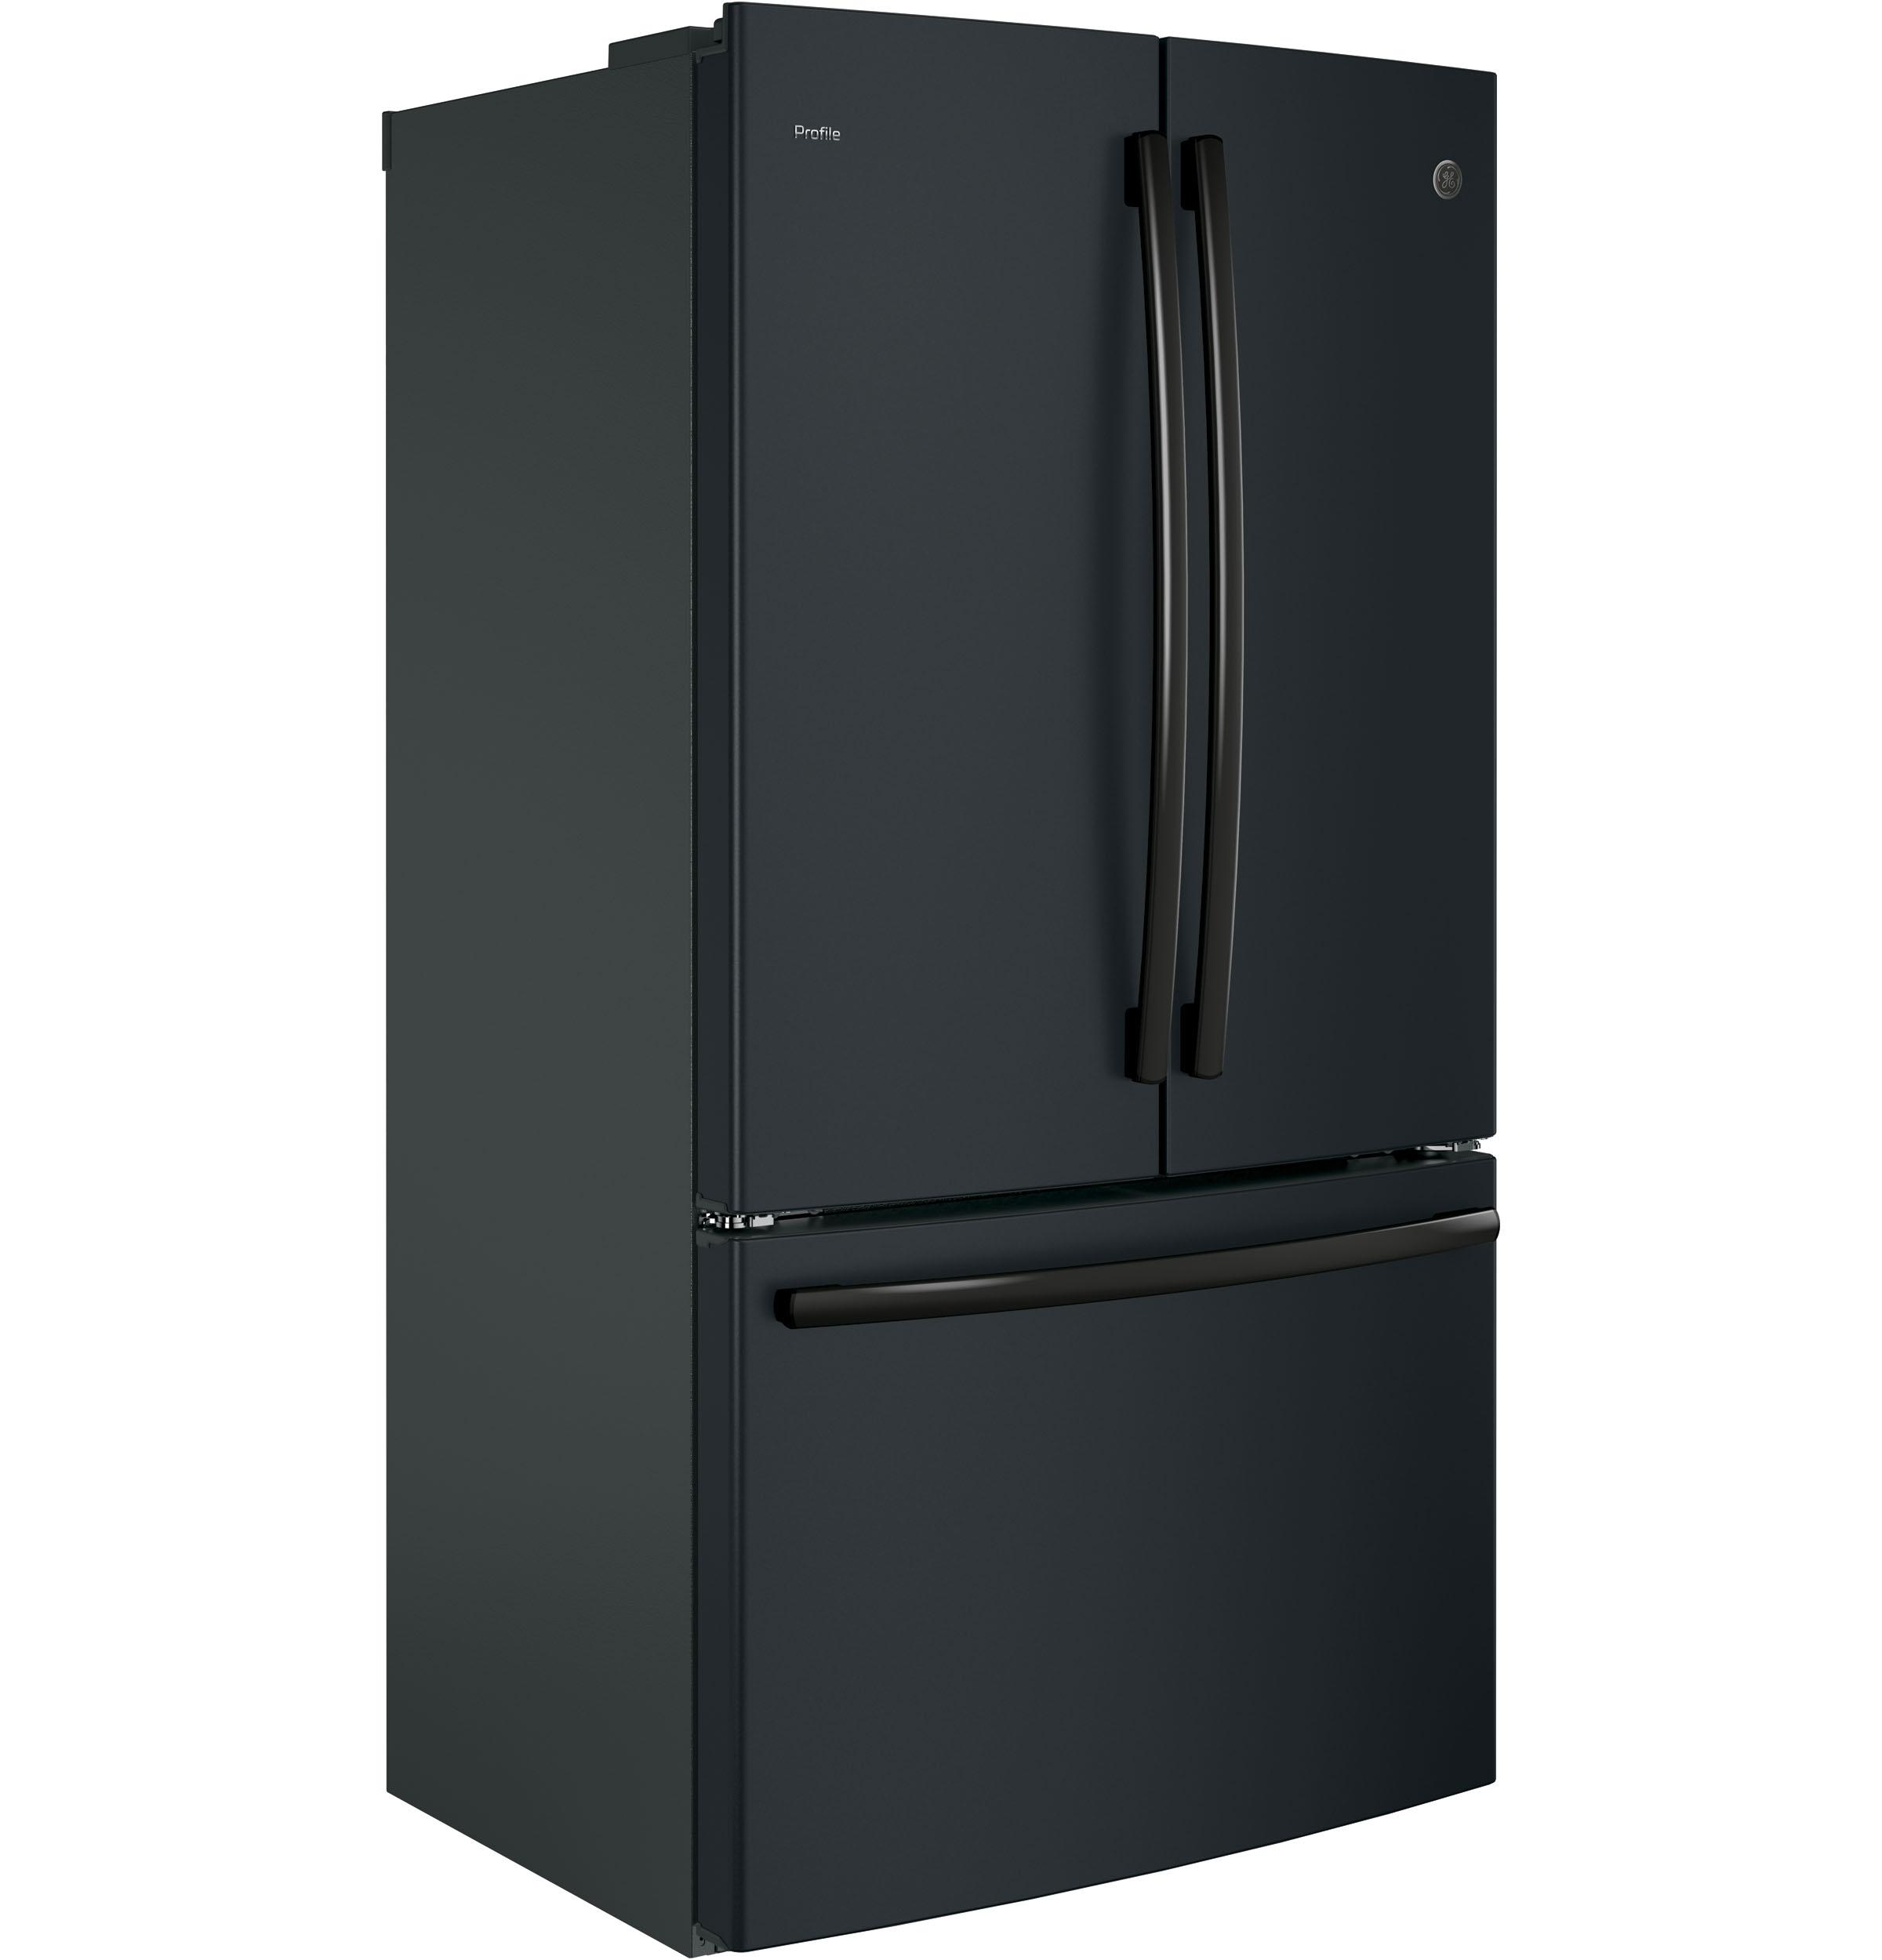 Model: PWE23KELDS | GE Profile™ Series ENERGY STAR® 23.1 Cu. Ft. Counter-Depth French-Door Refrigerator